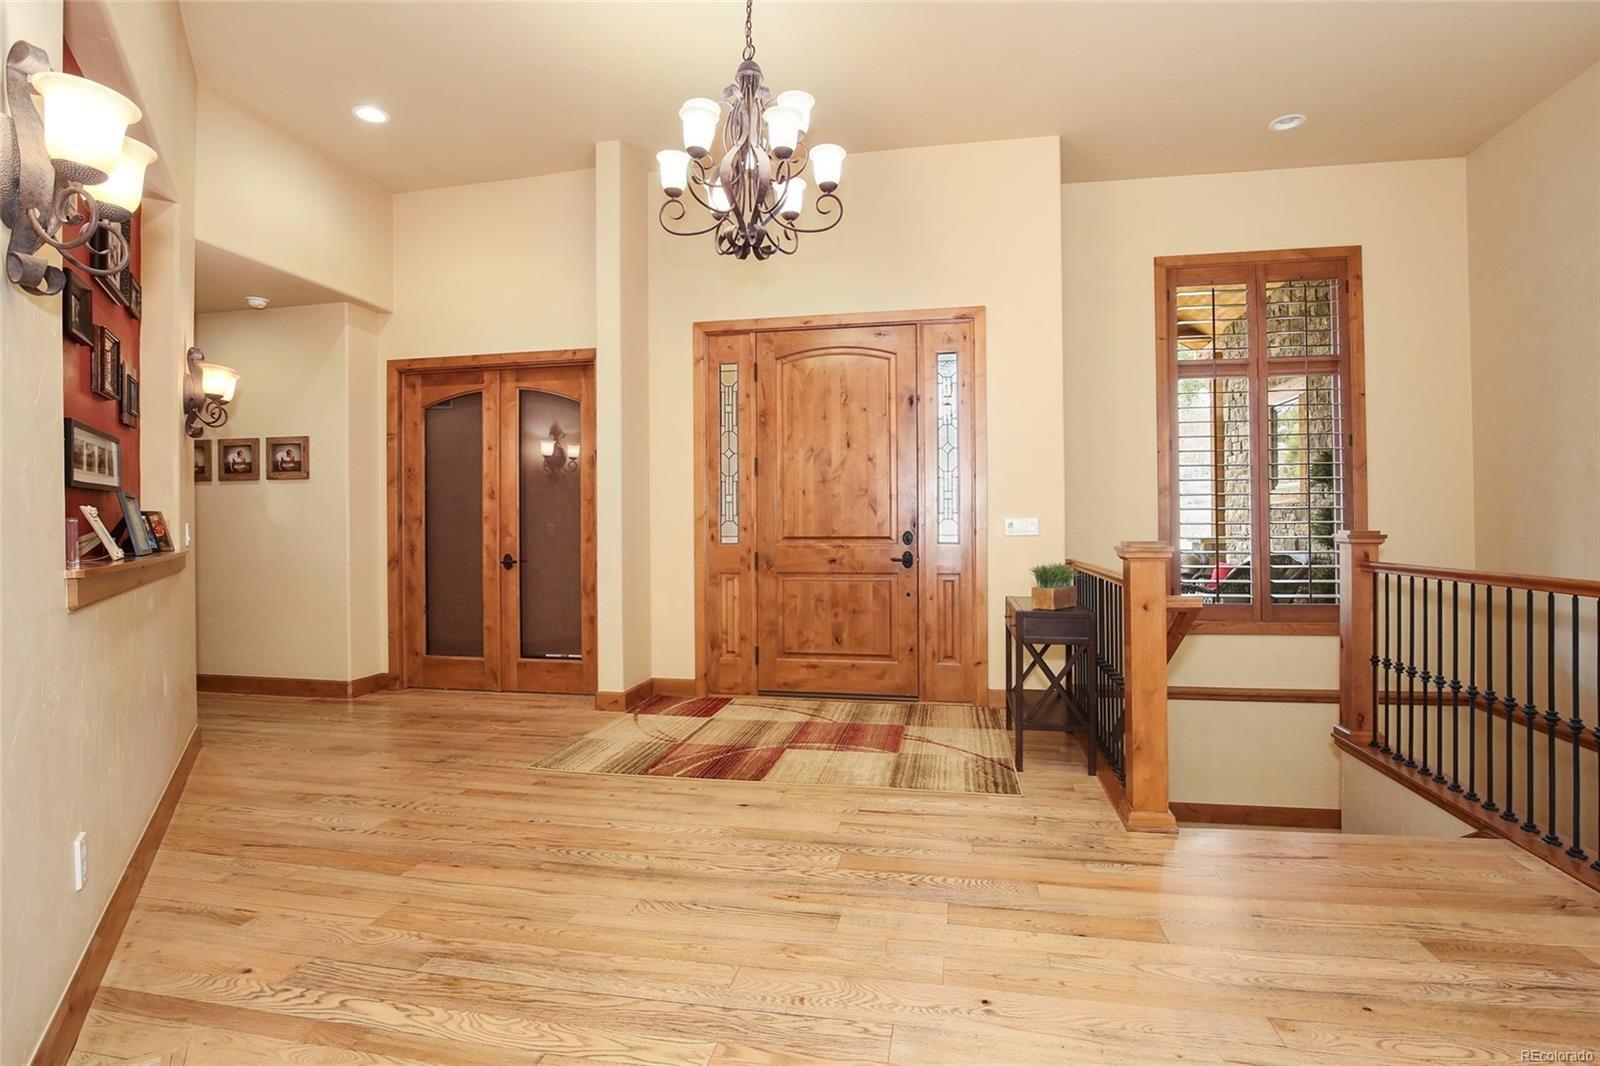 MLS# 4879945 - 6 - 2392 Saddleback Drive, Castle Rock, CO 80104